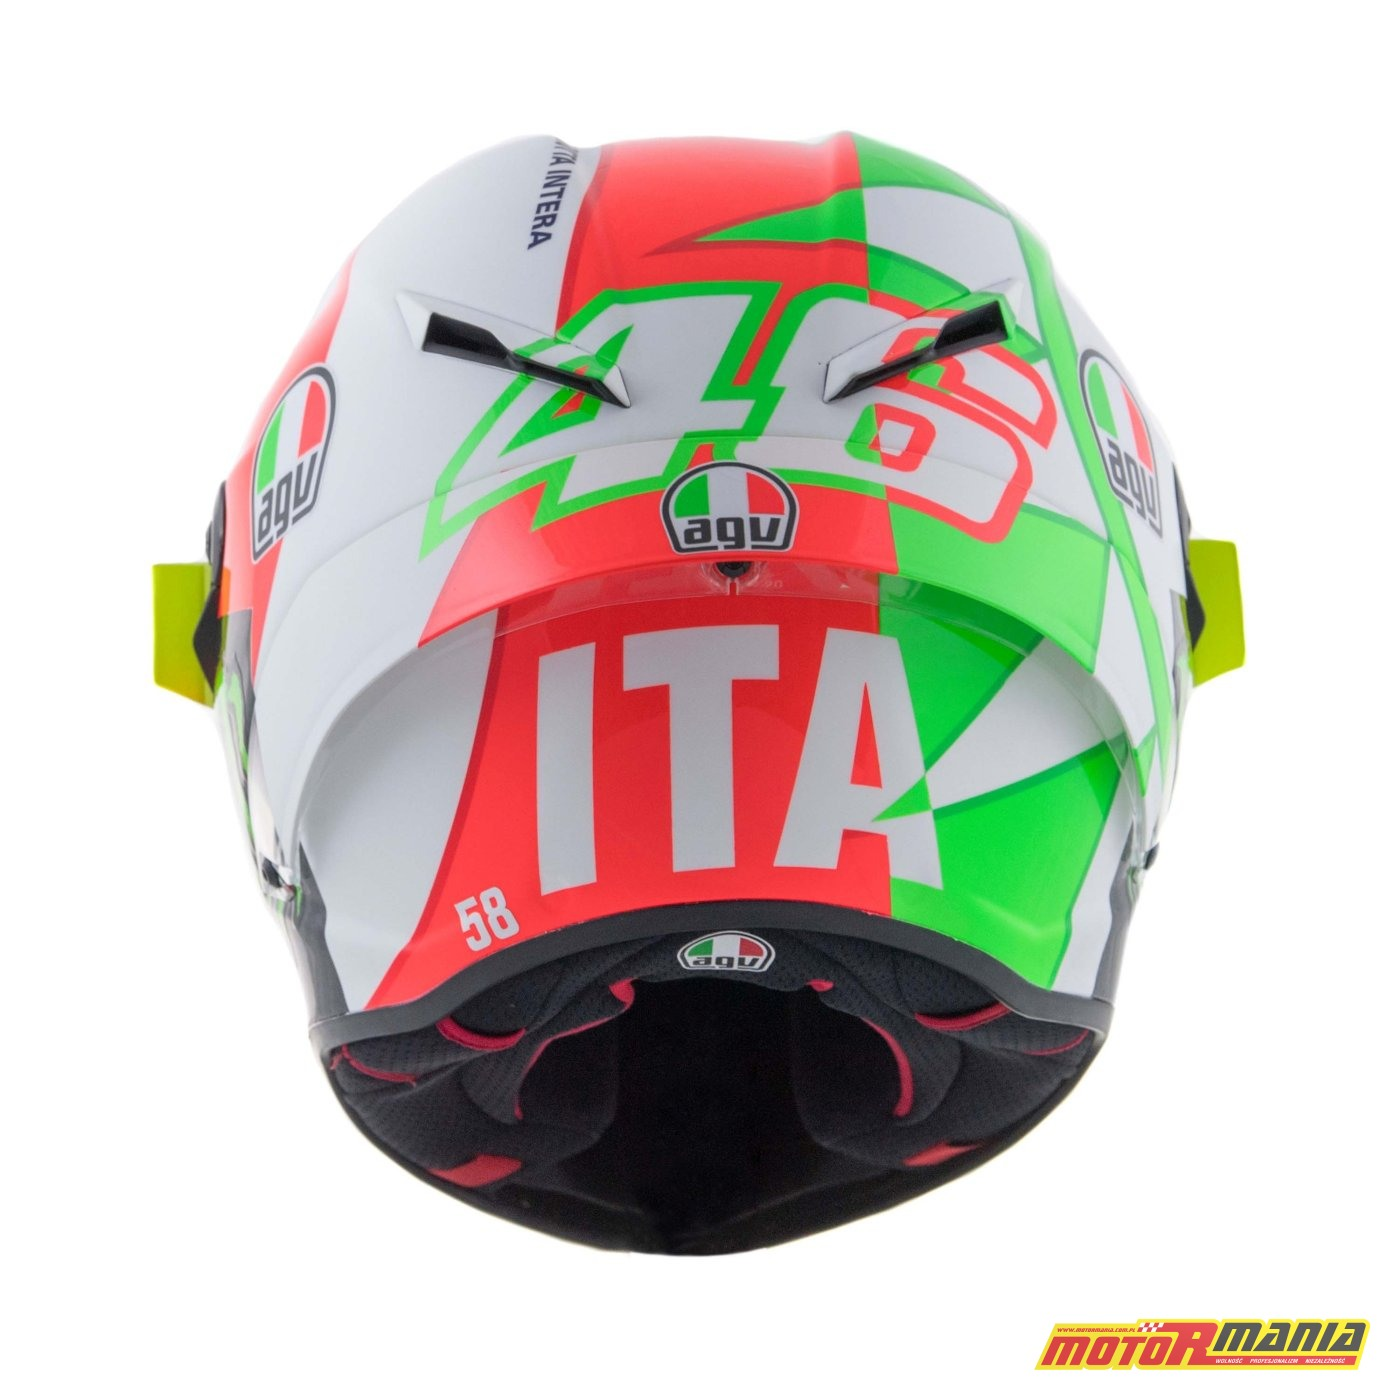 AGV Pista GP R Mugello 2018 kask Valentino Rossiego MotoGP (3)